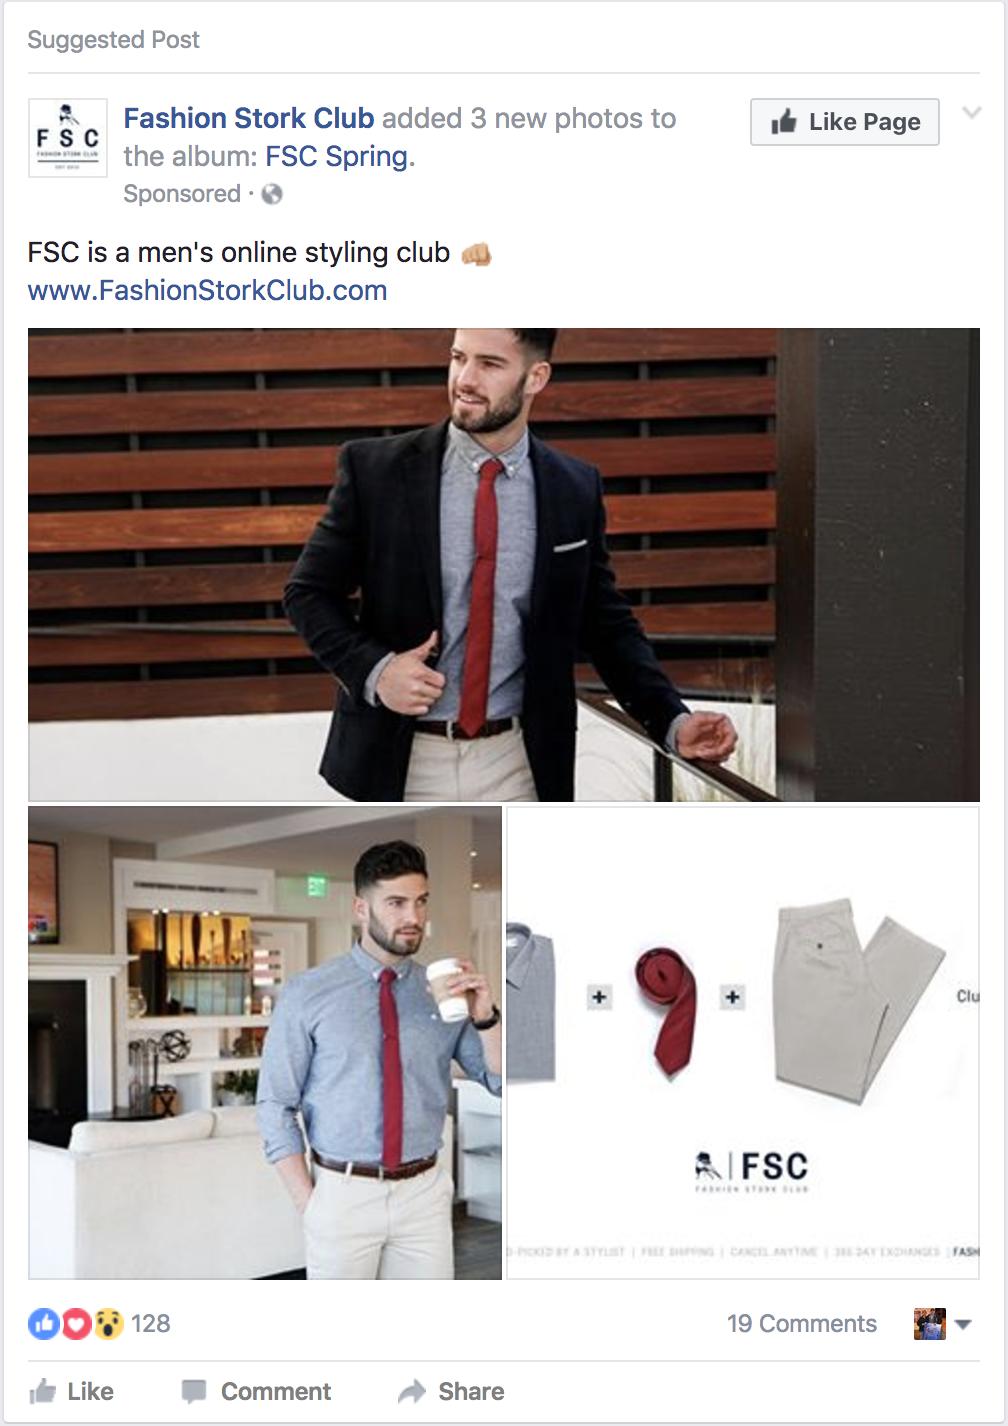 Facebook Post Engagement